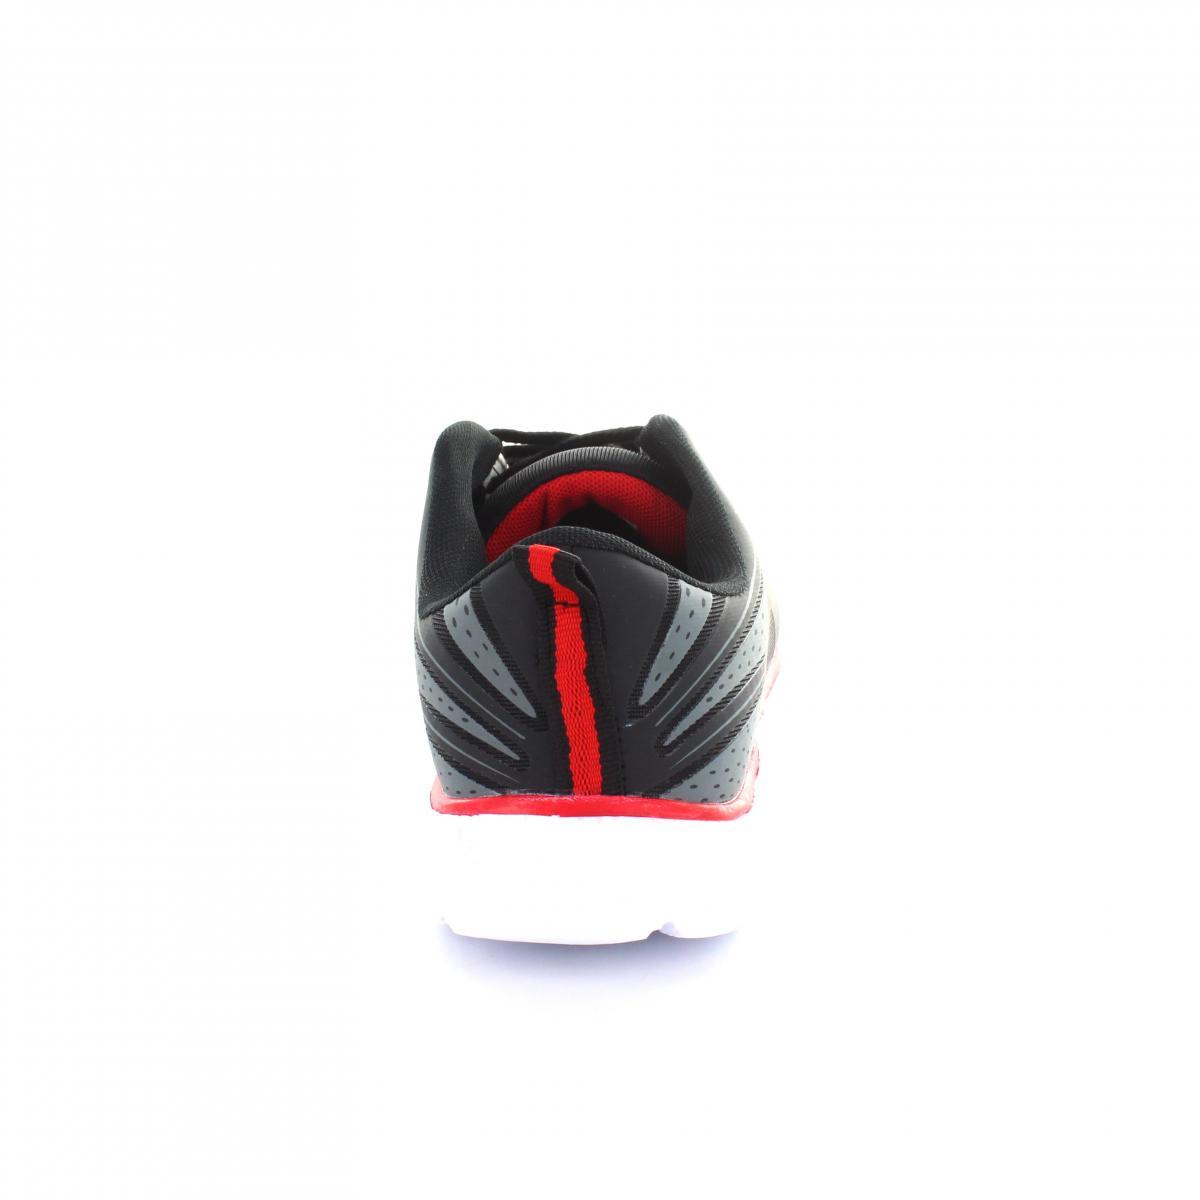 b020fd397 ... Tenis para Hombre Catapult 11126 Color Black/red ...